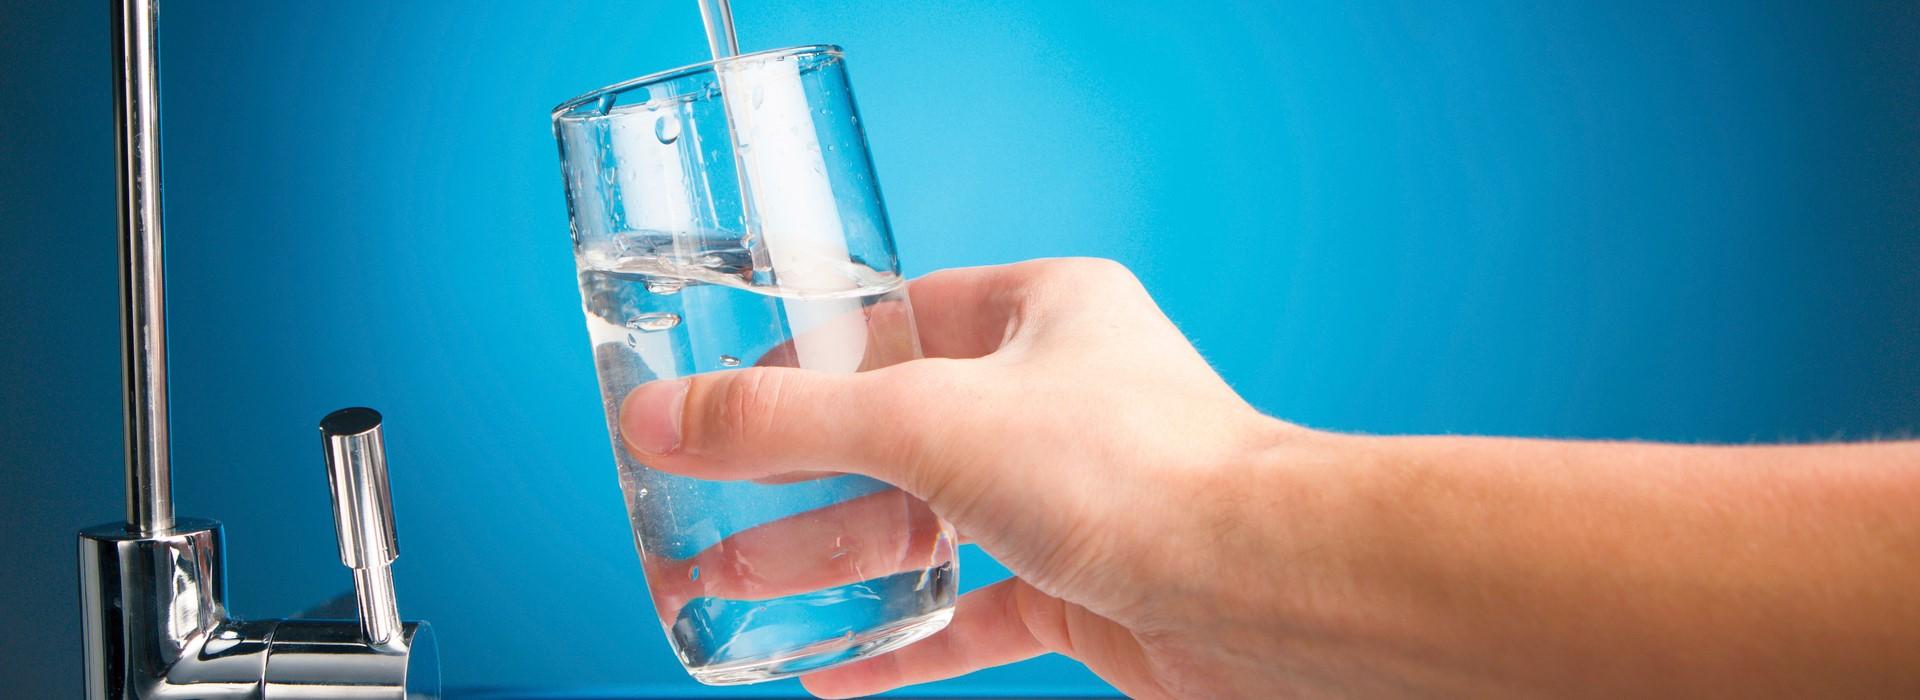 Healthier Great Tasting Water on Tap